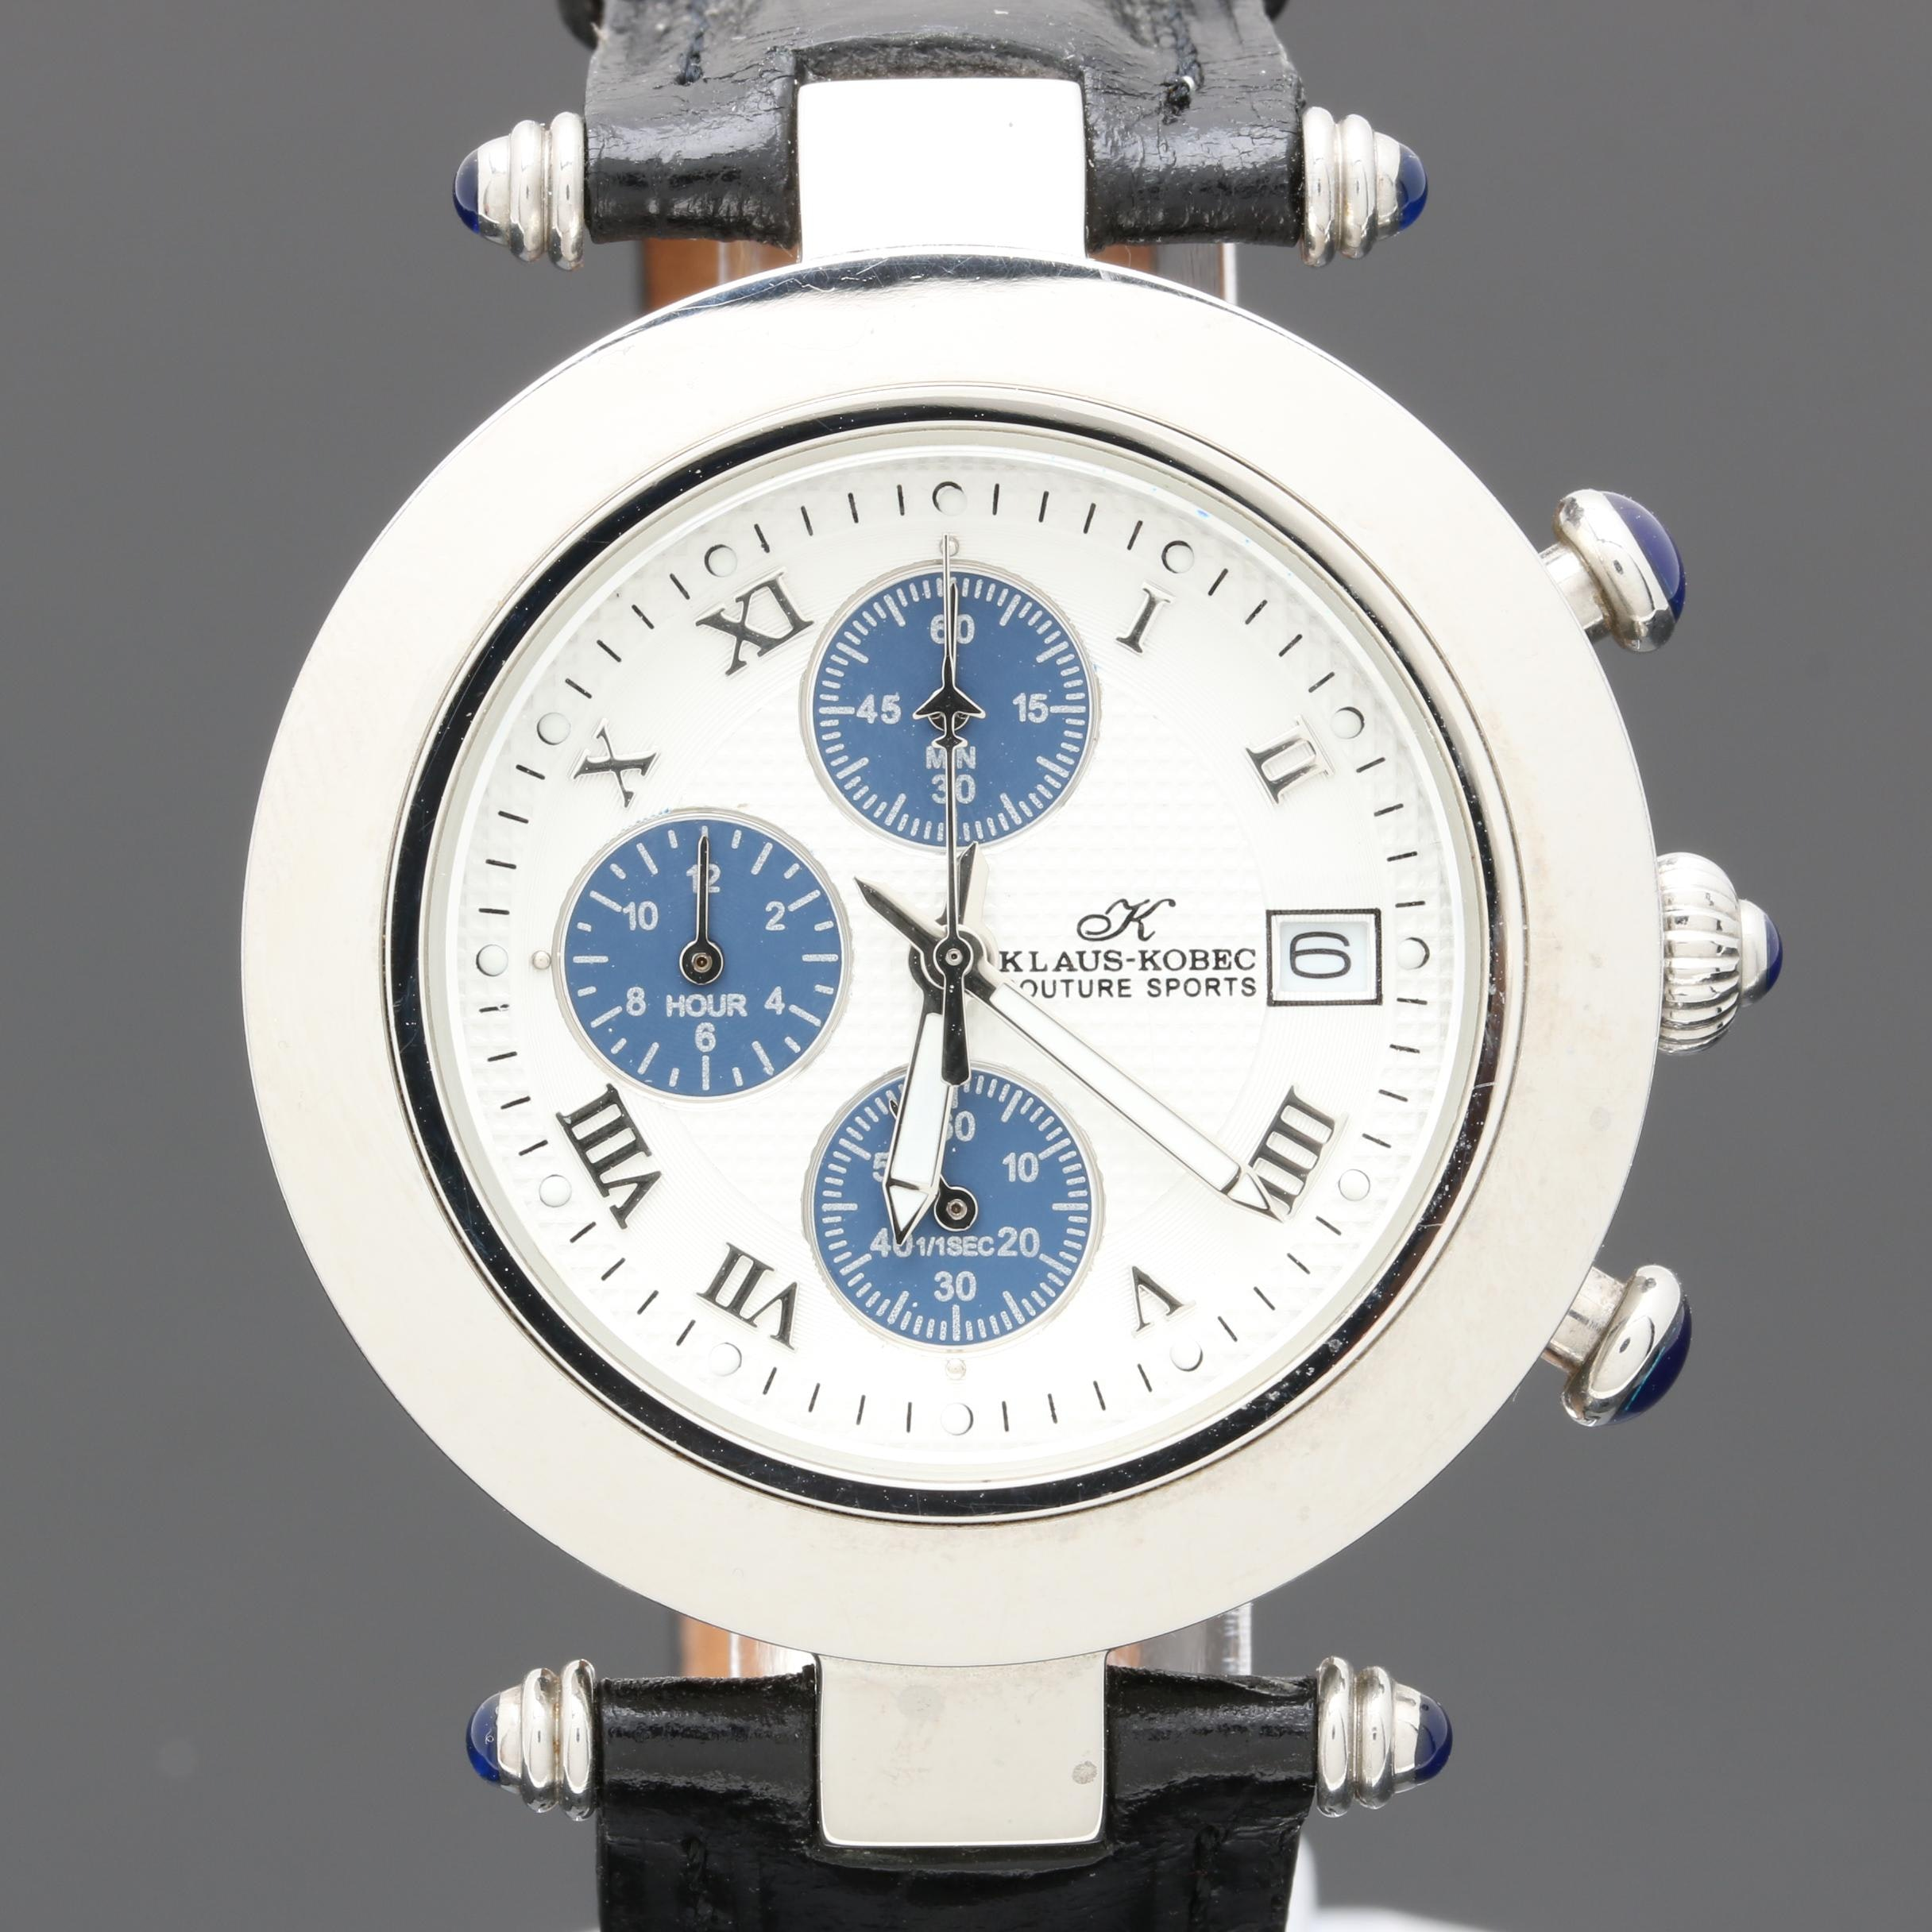 Klaus-Kobec Stainless Steel Chronograph Wristwatch